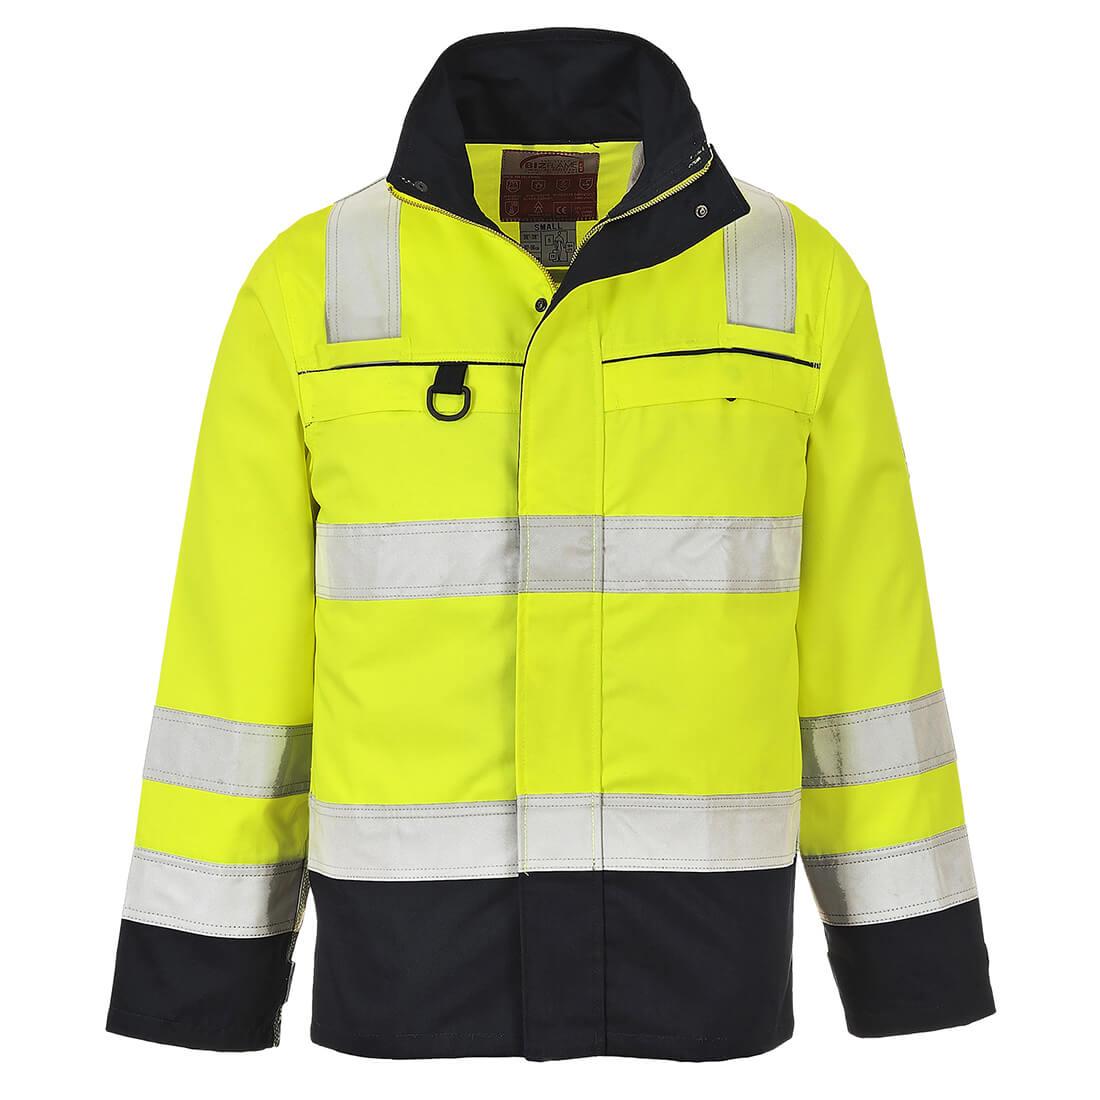 Image of Biz Flame Flame Resistant Hi Vis Multi Norm Jacket Yellow / Navy L